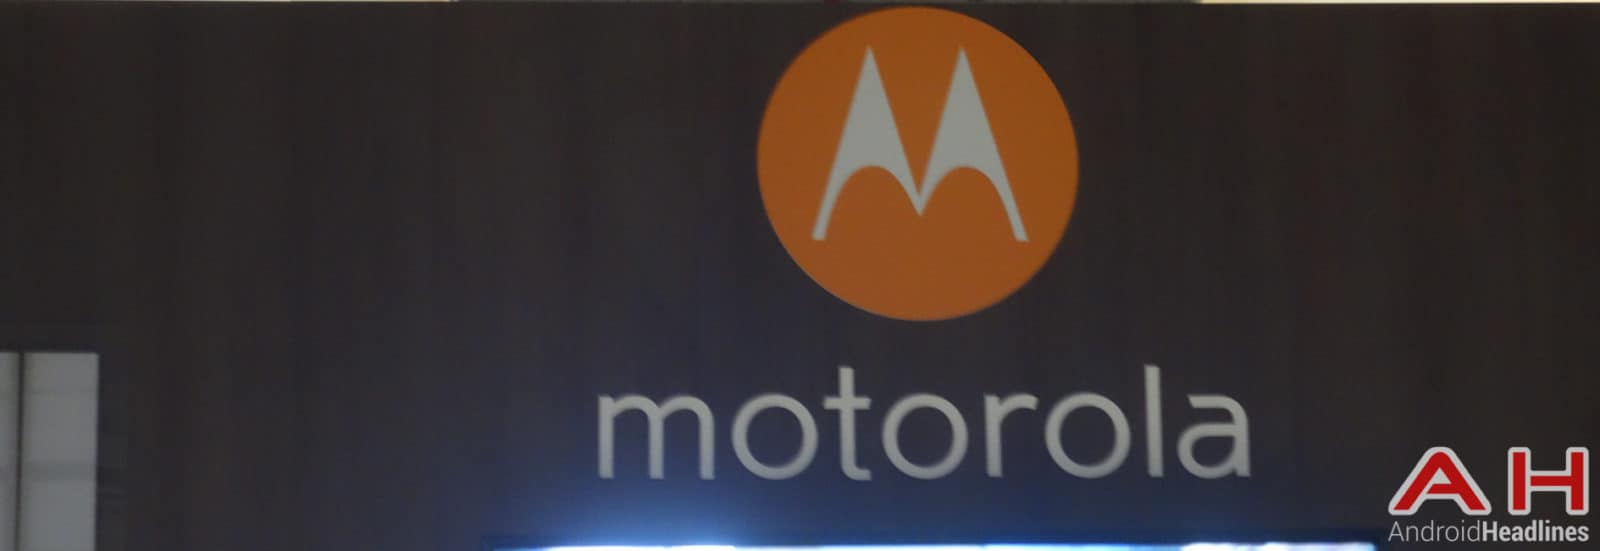 Motorola-AH-75